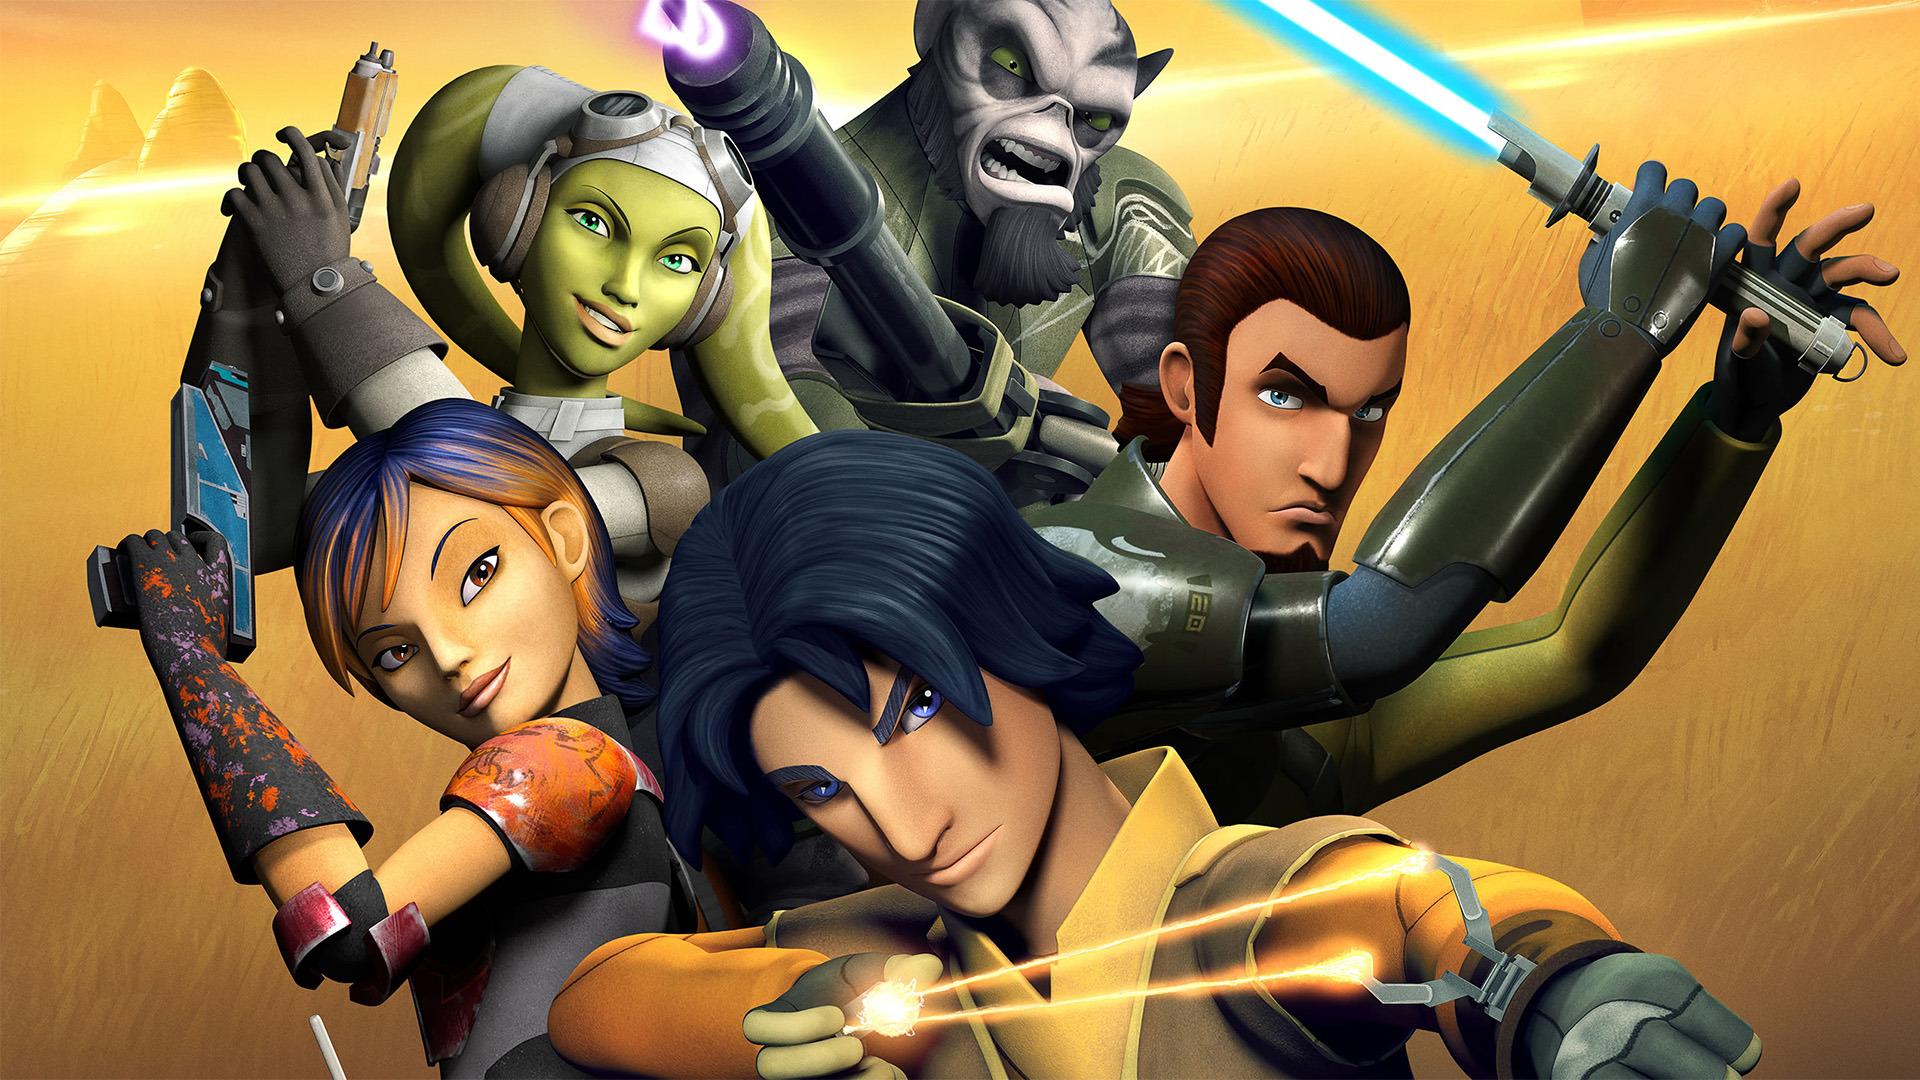 Cartoon Star Wars Rebels